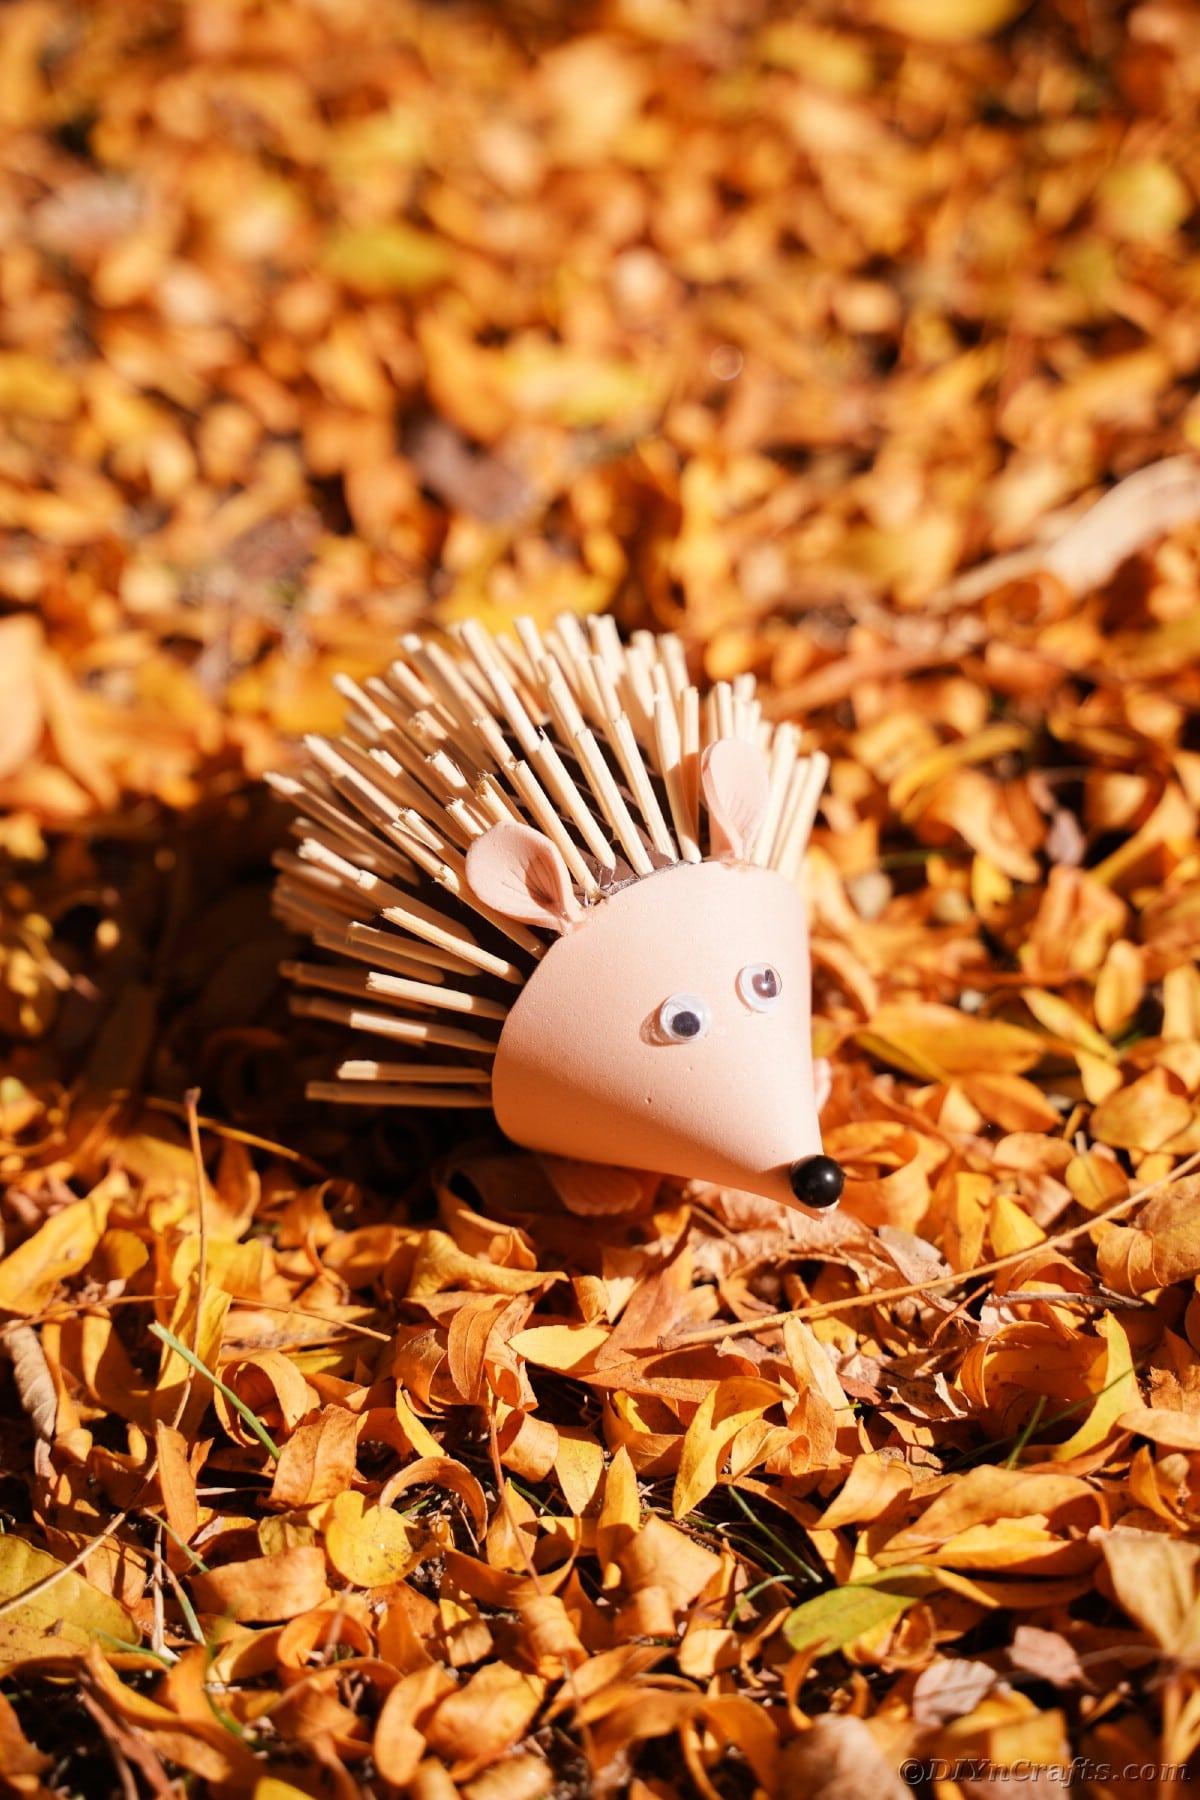 Pile of orange leaves with mini foam hedgehog on top